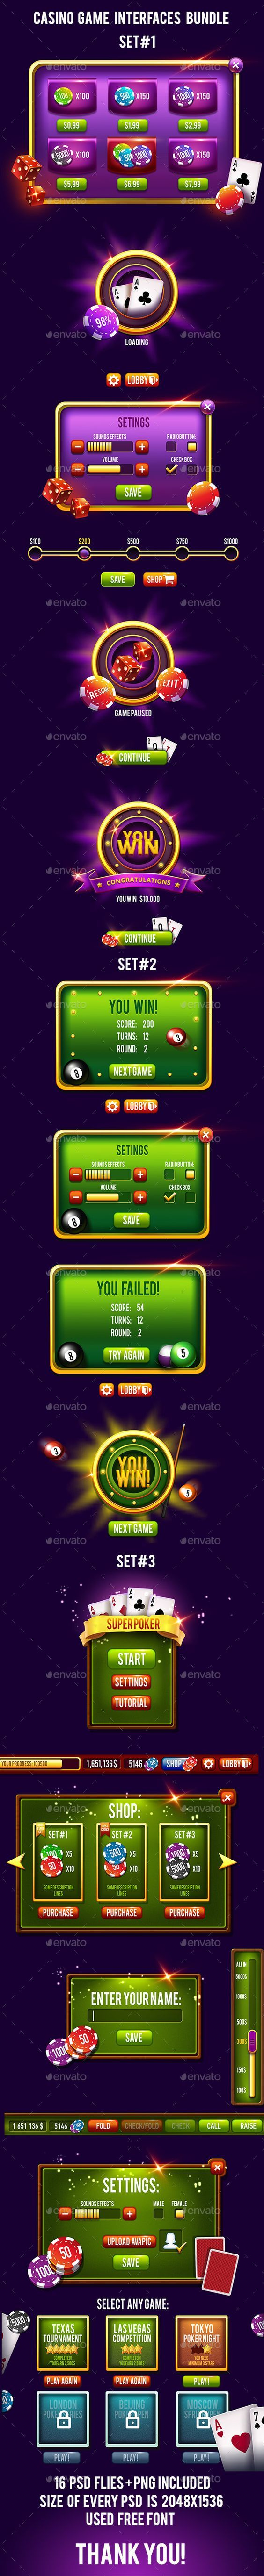 Bingo casino net games urban warfare 2